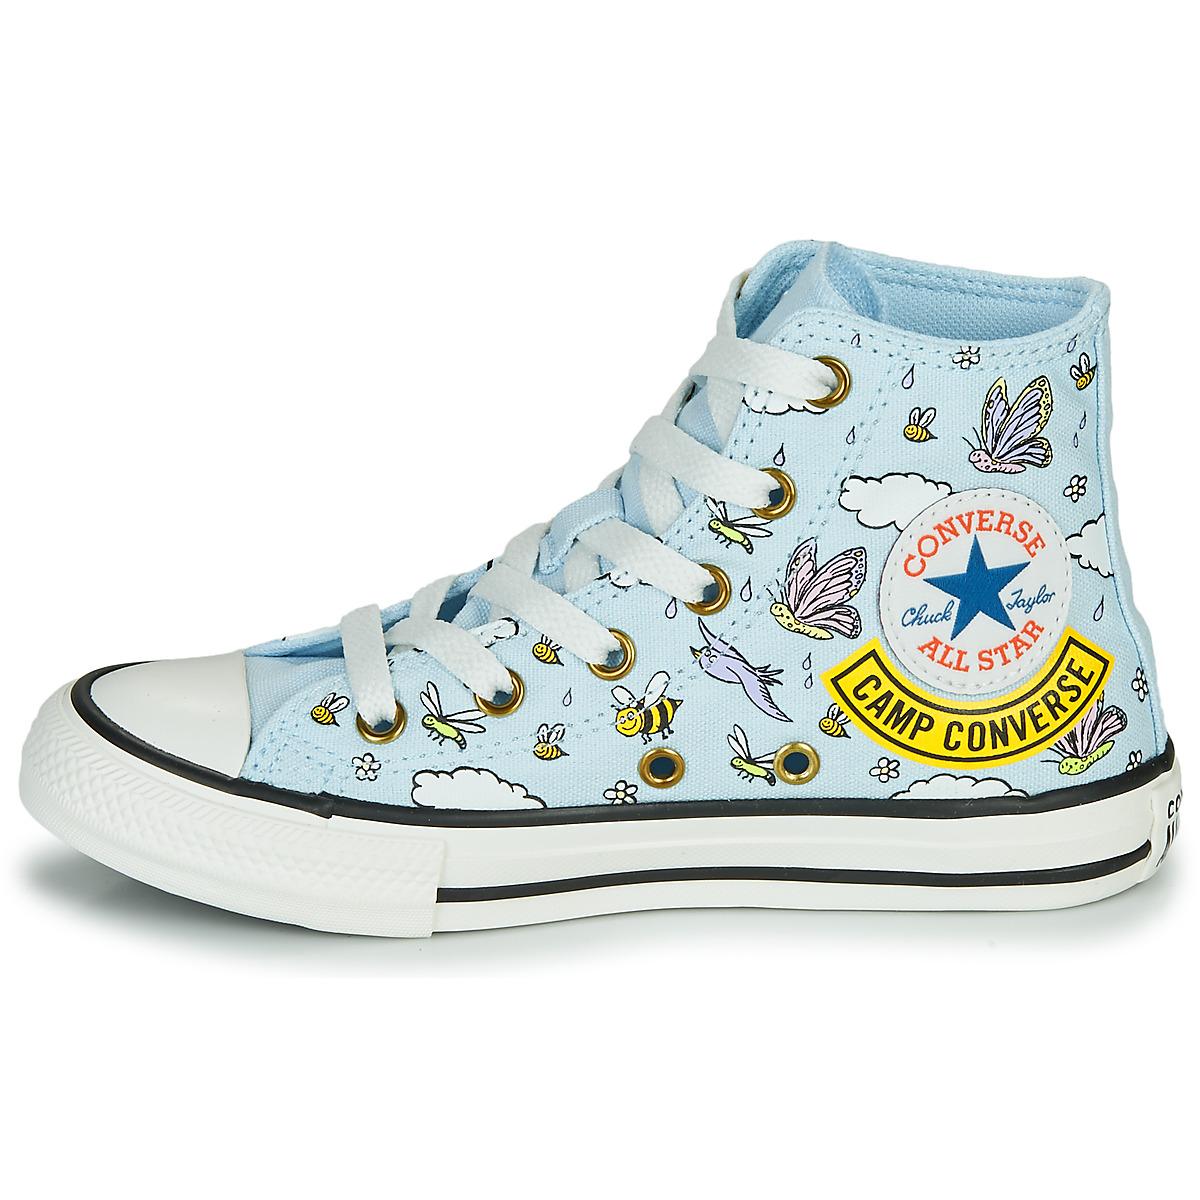 Converse CHUCK TAYLOR ALL STAR CAMP CONVERSE Blu Bambina 16610060 ...